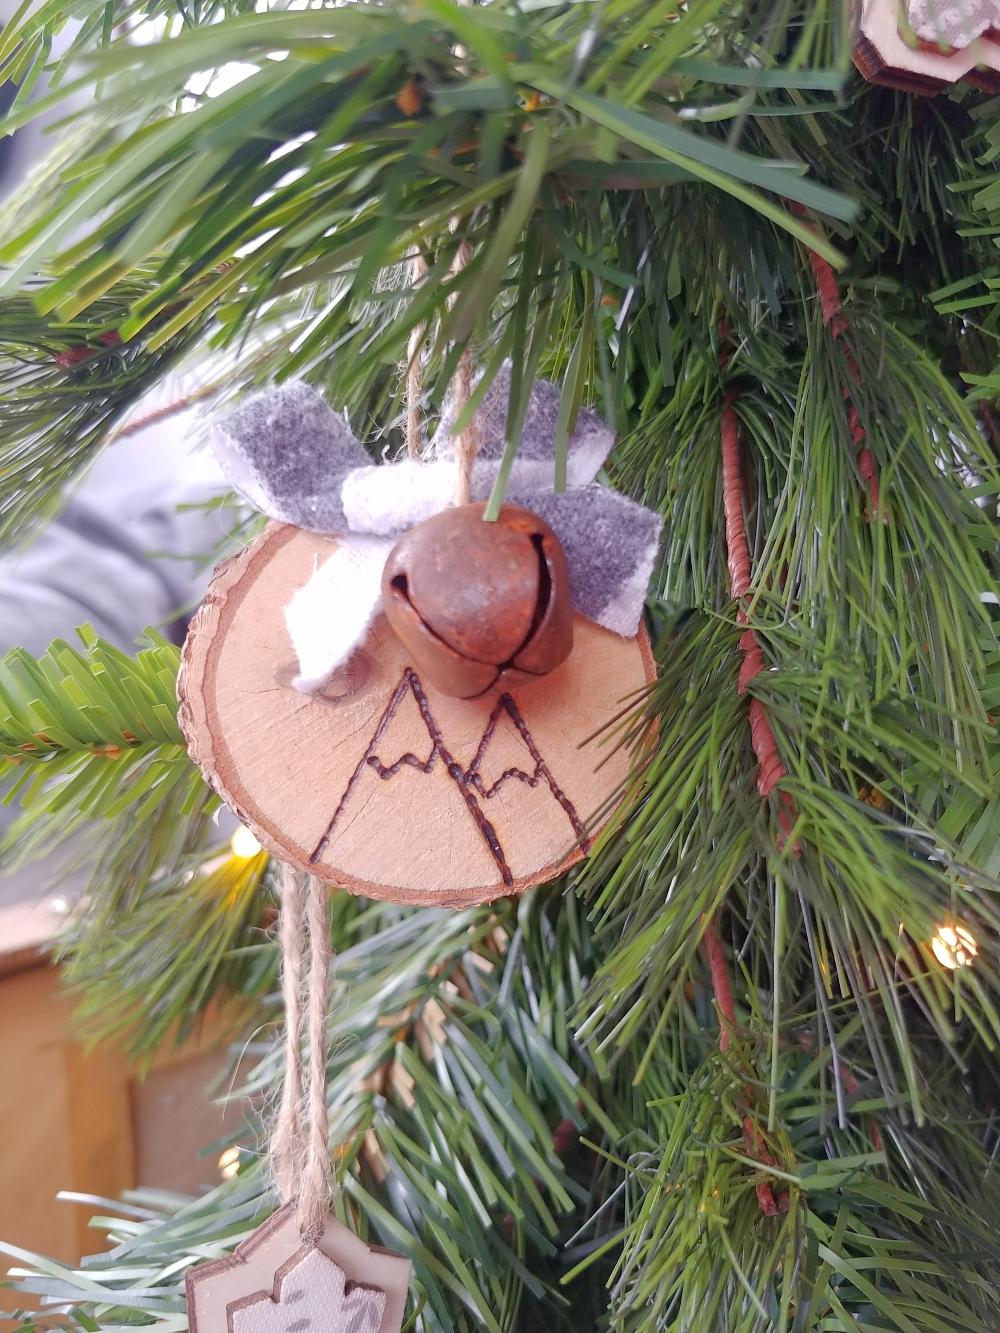 rustic wood burned ornaments